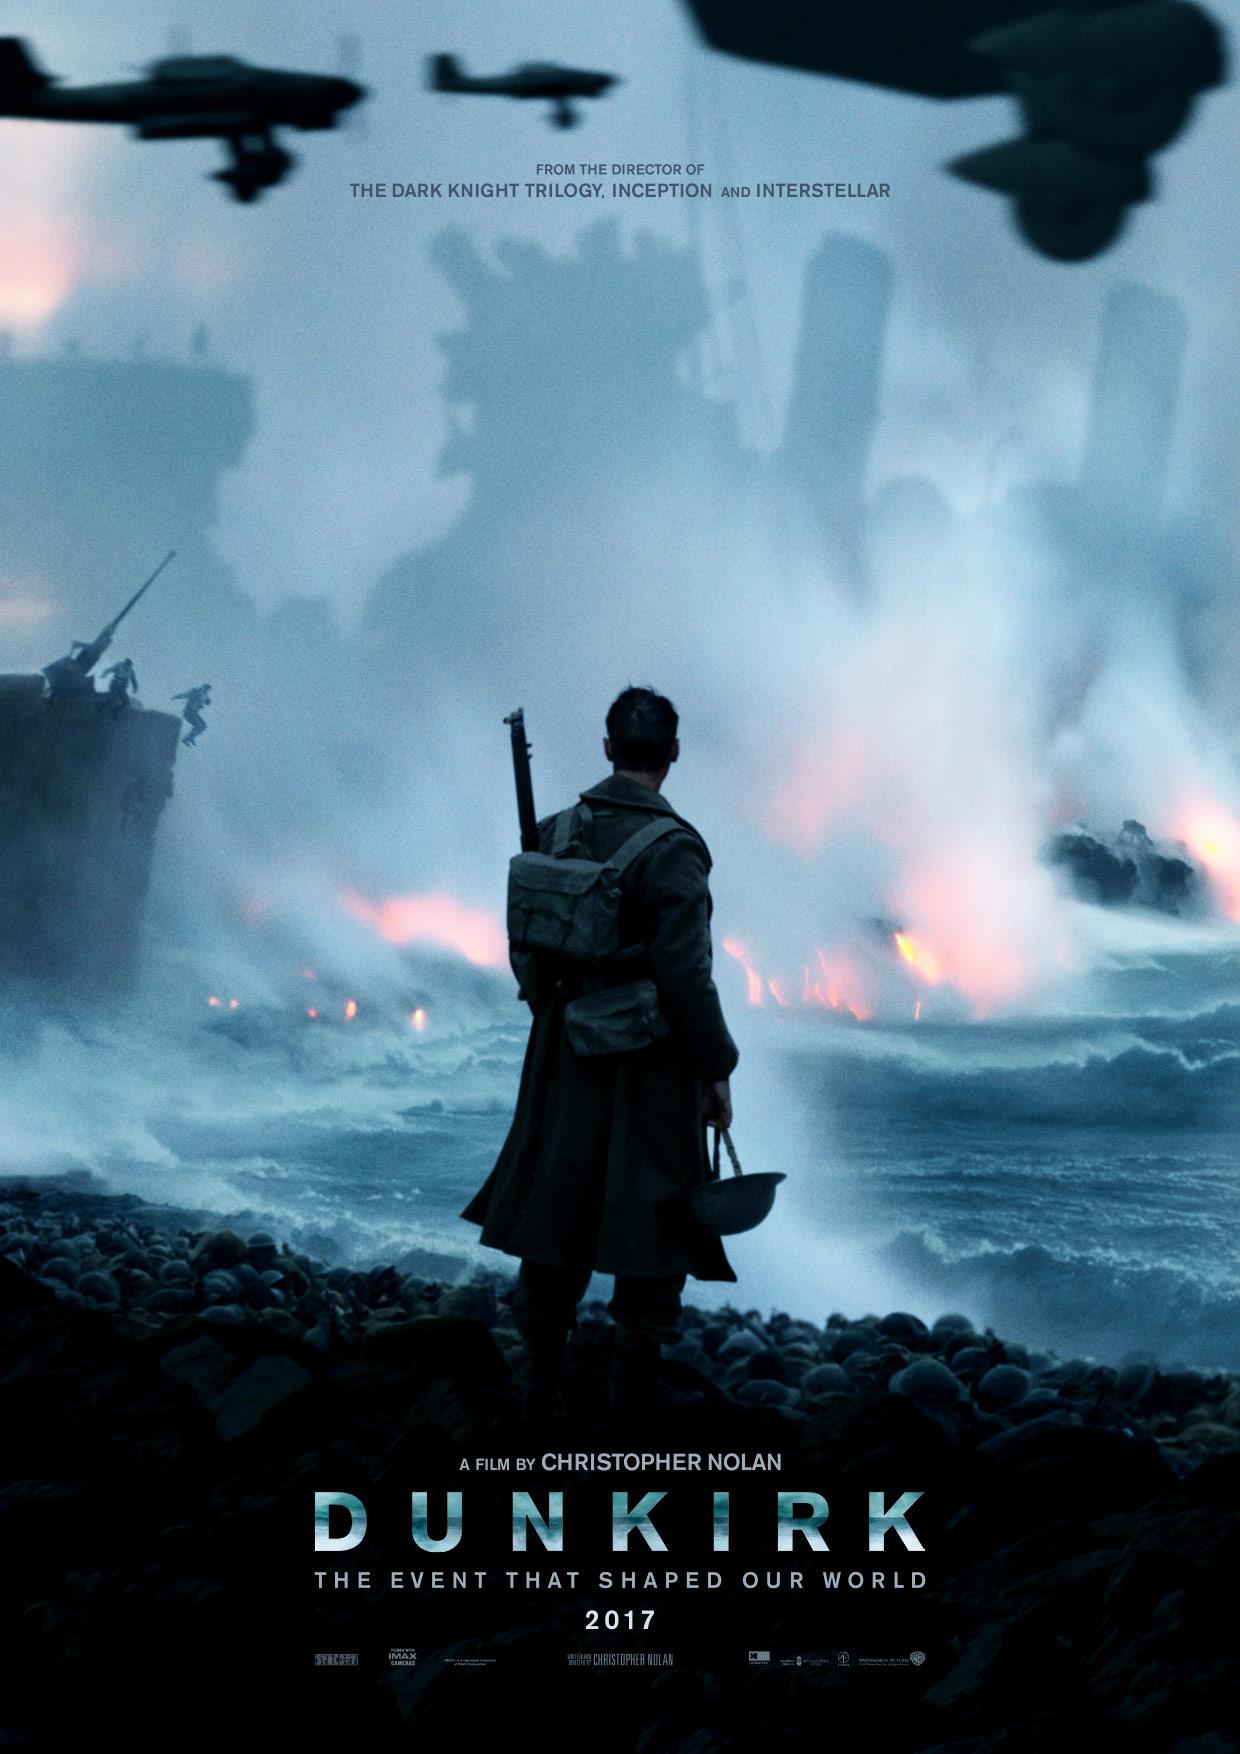 Christopher Nolan lover en storslagen krigsfilm med Dunkirk (19.07.)